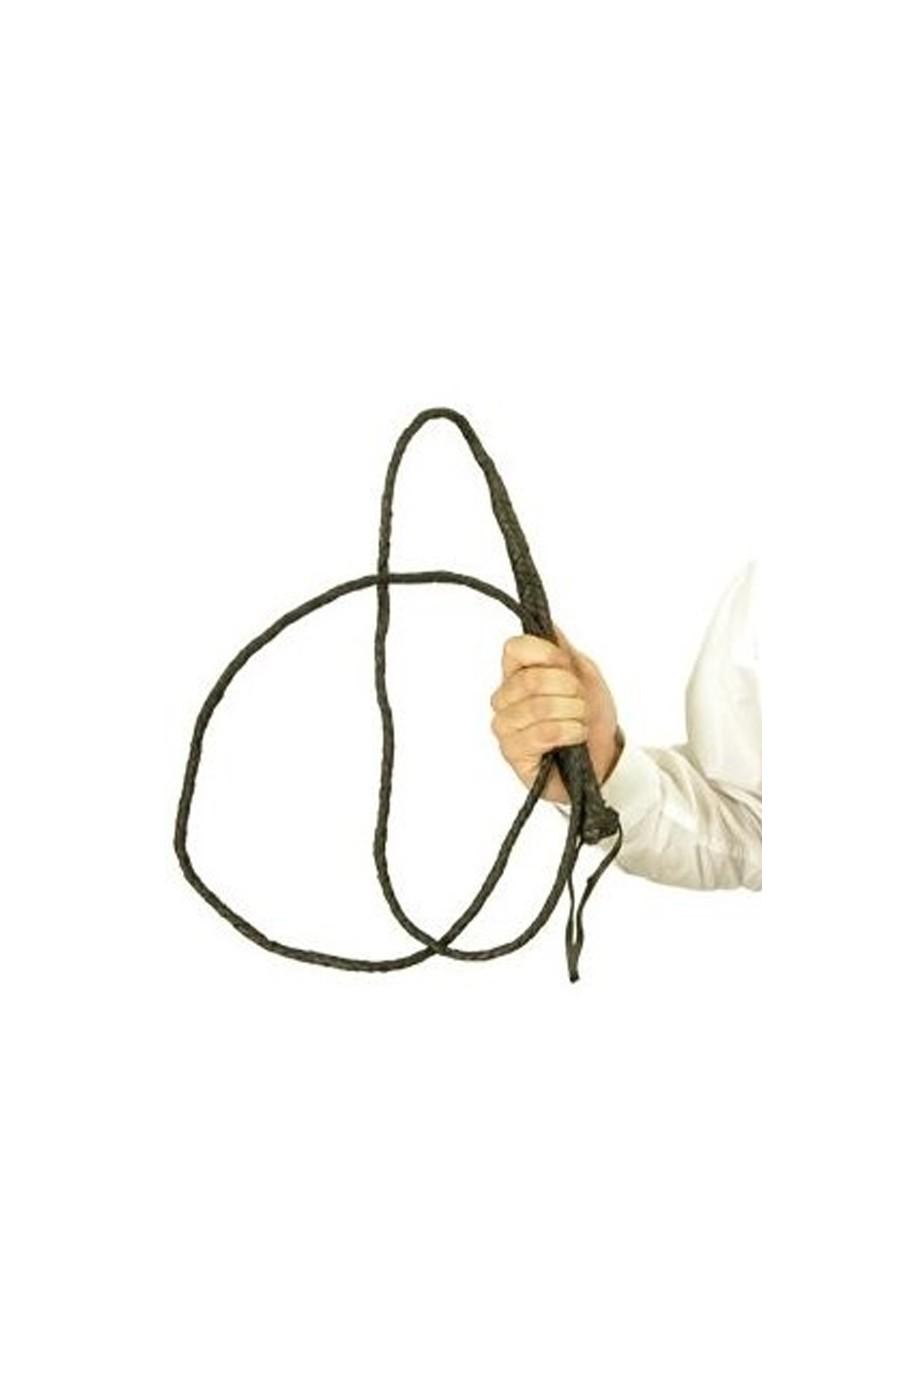 Frusta finta 240 cm Indiana Jones